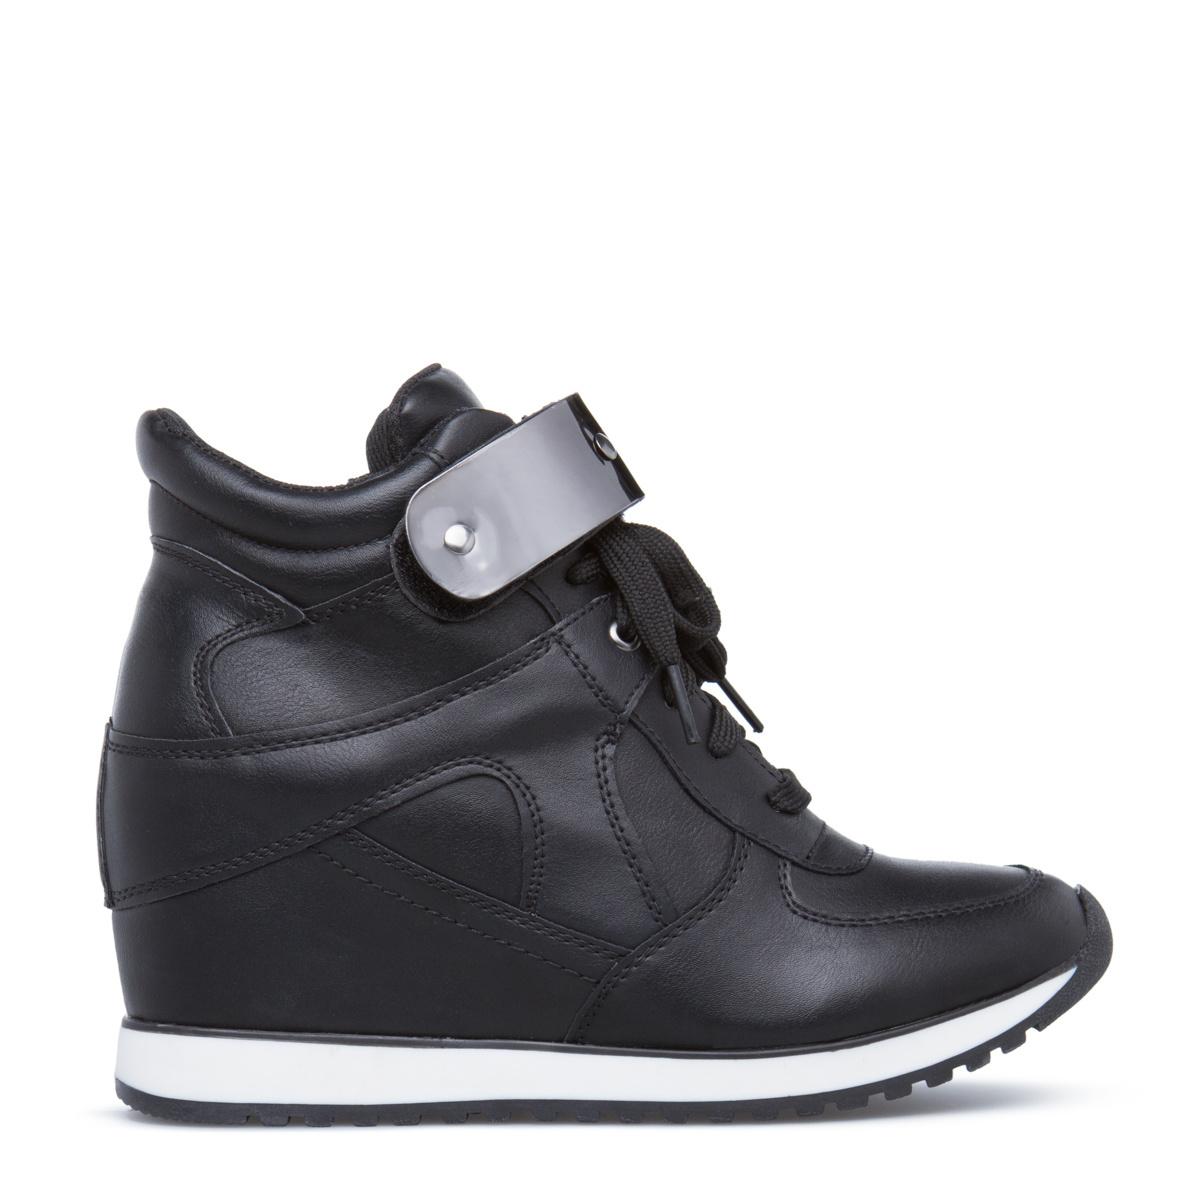 Women&39s Wedge Shoes Platform Shoes Black Wedge High Heels Wedge